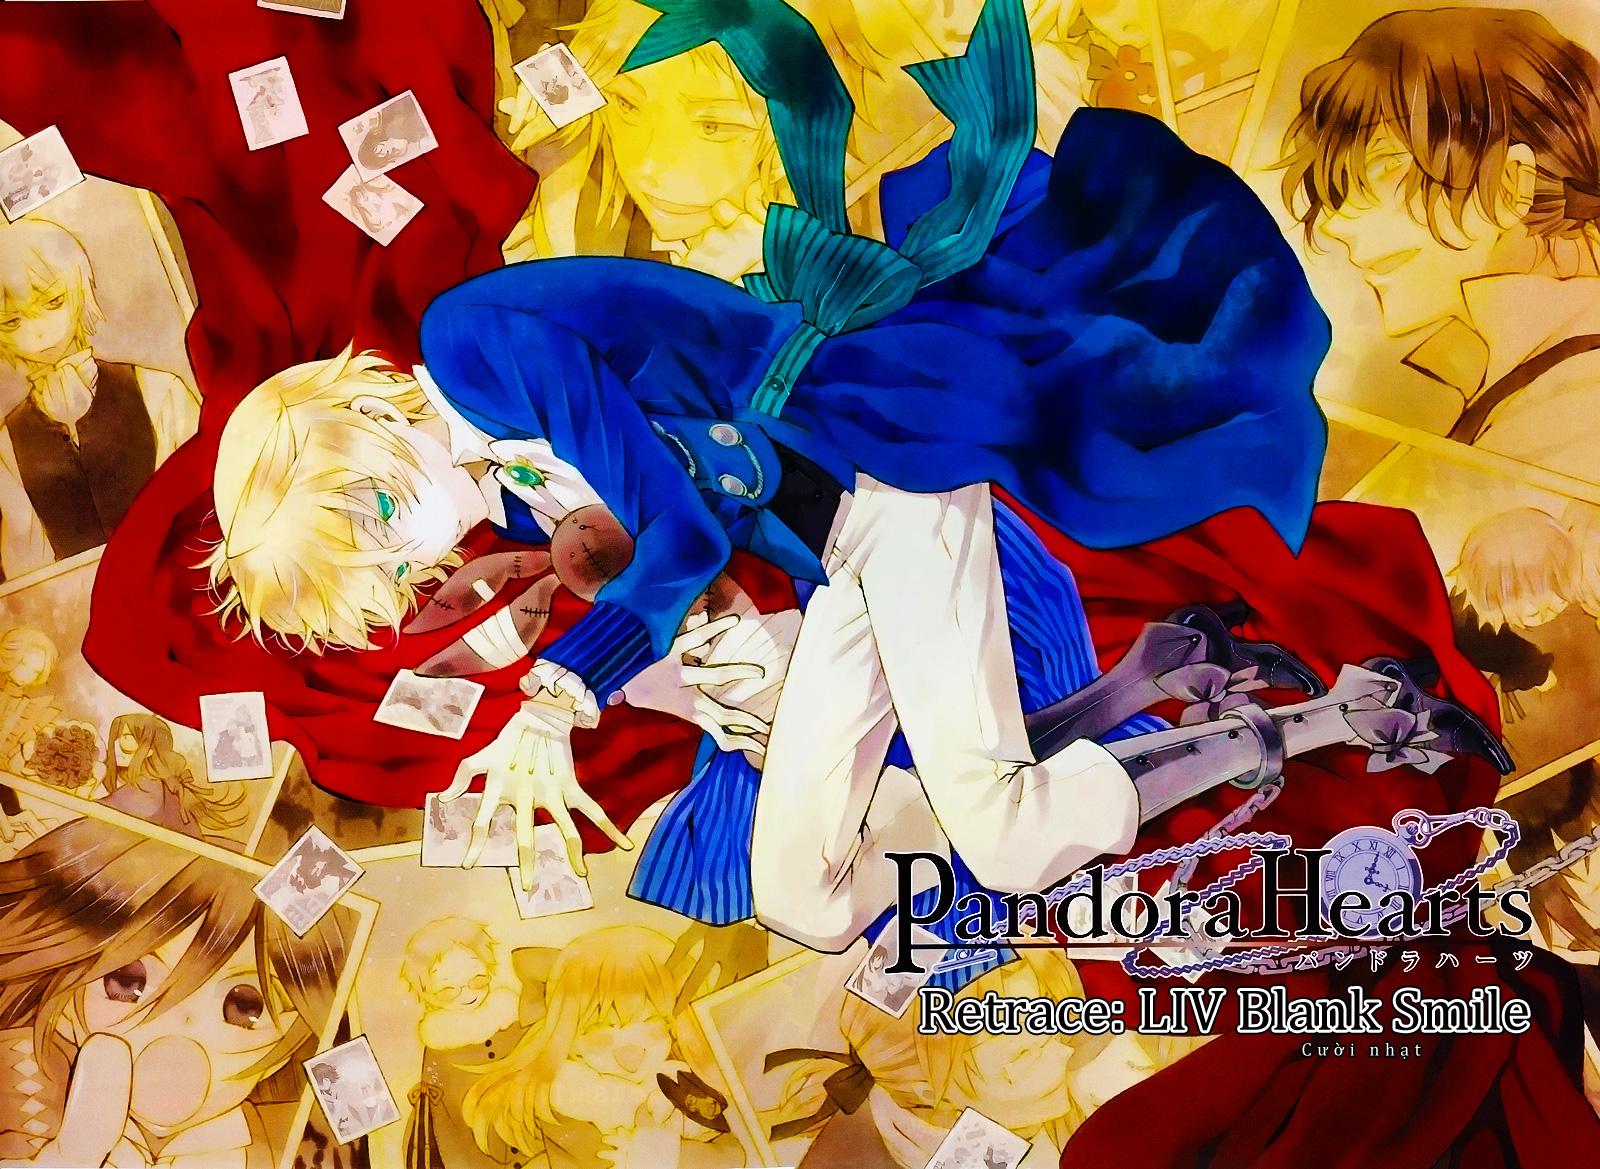 Pandora Hearts chương 054 - retrace: liv blank smile trang 2